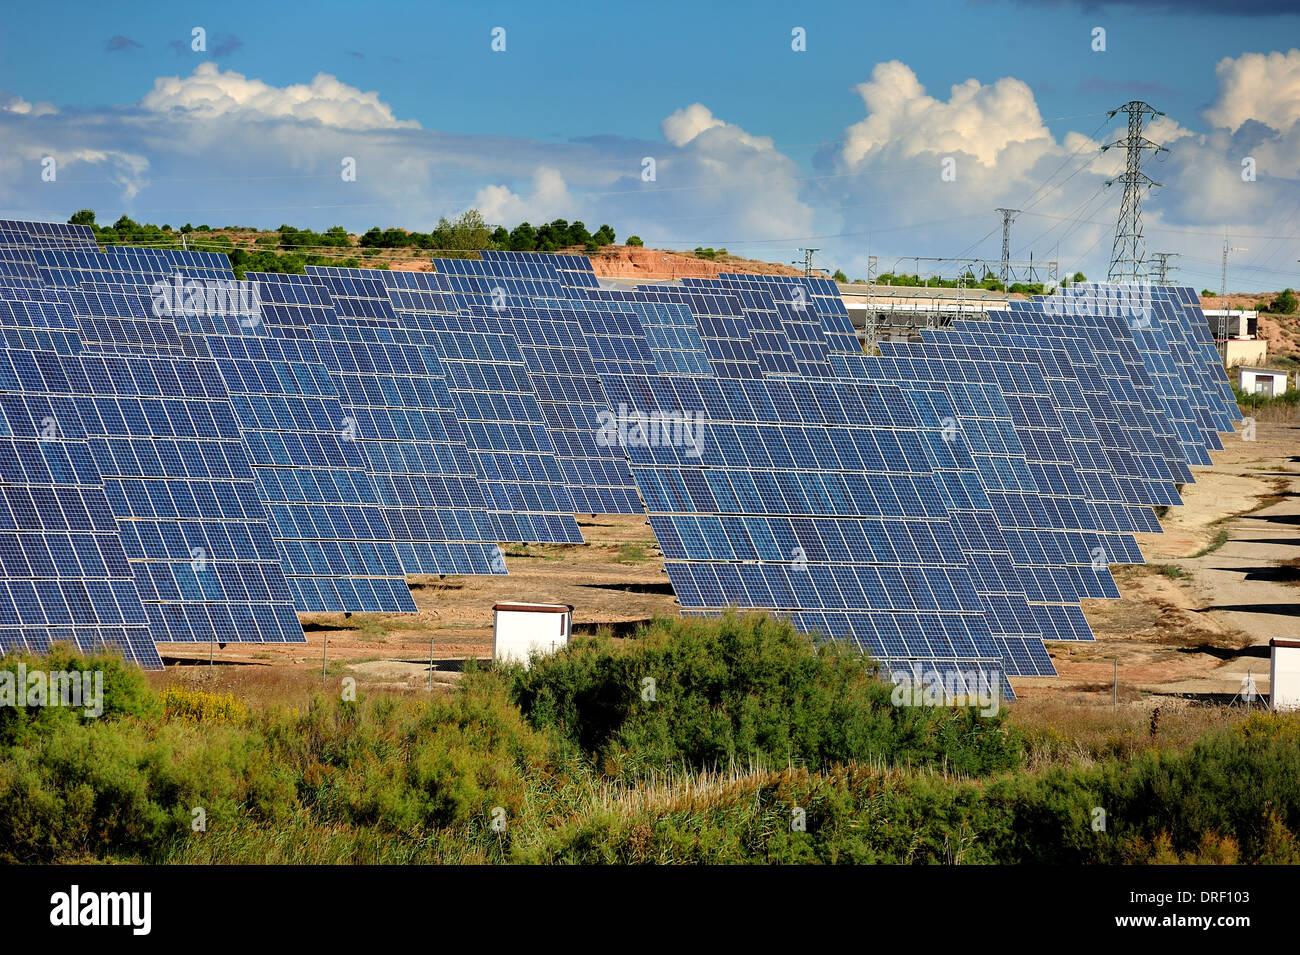 Solar power plant. Rows of photovoltaic arrays, La Rioja, Spain, Europe - Stock Image